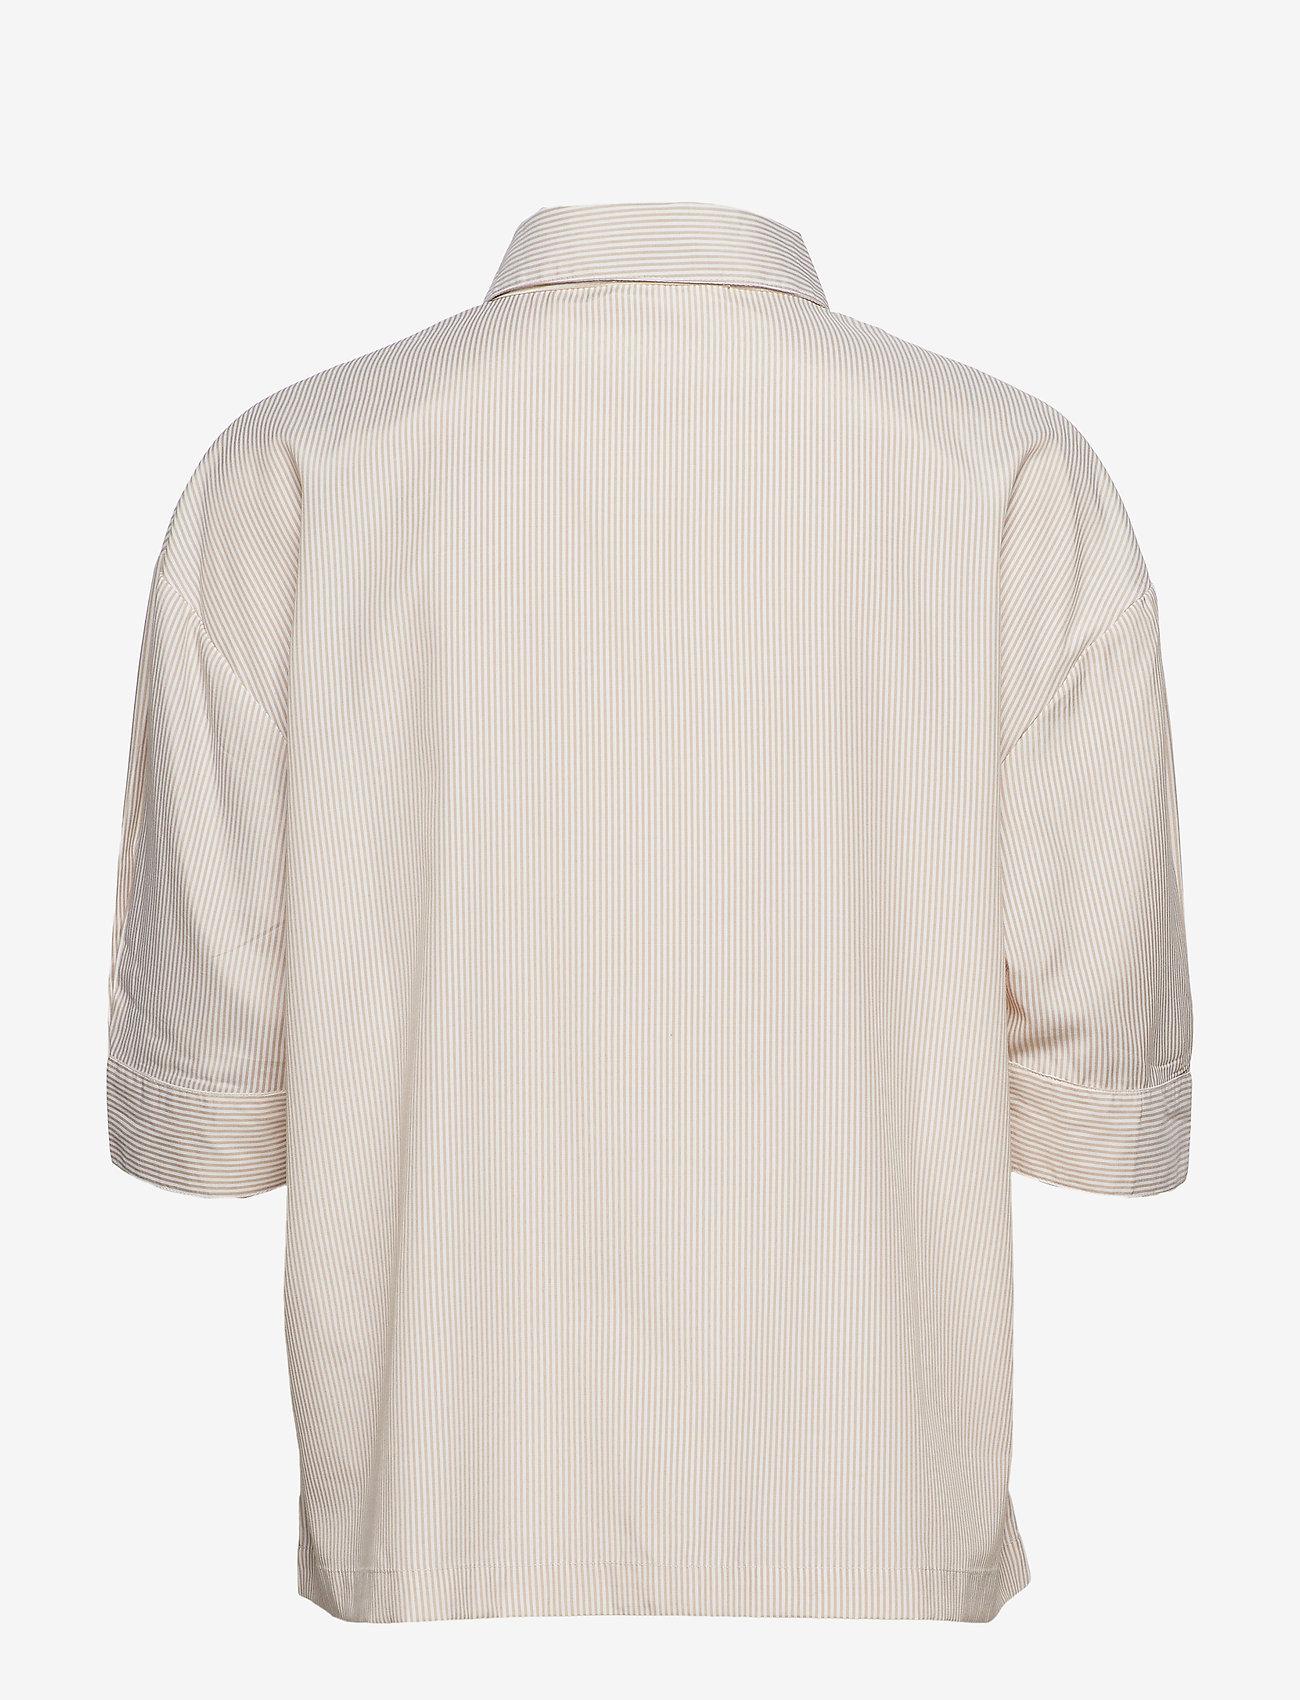 nué notes - Minelli Shirt - overhemden met korte mouwen - sand - 1